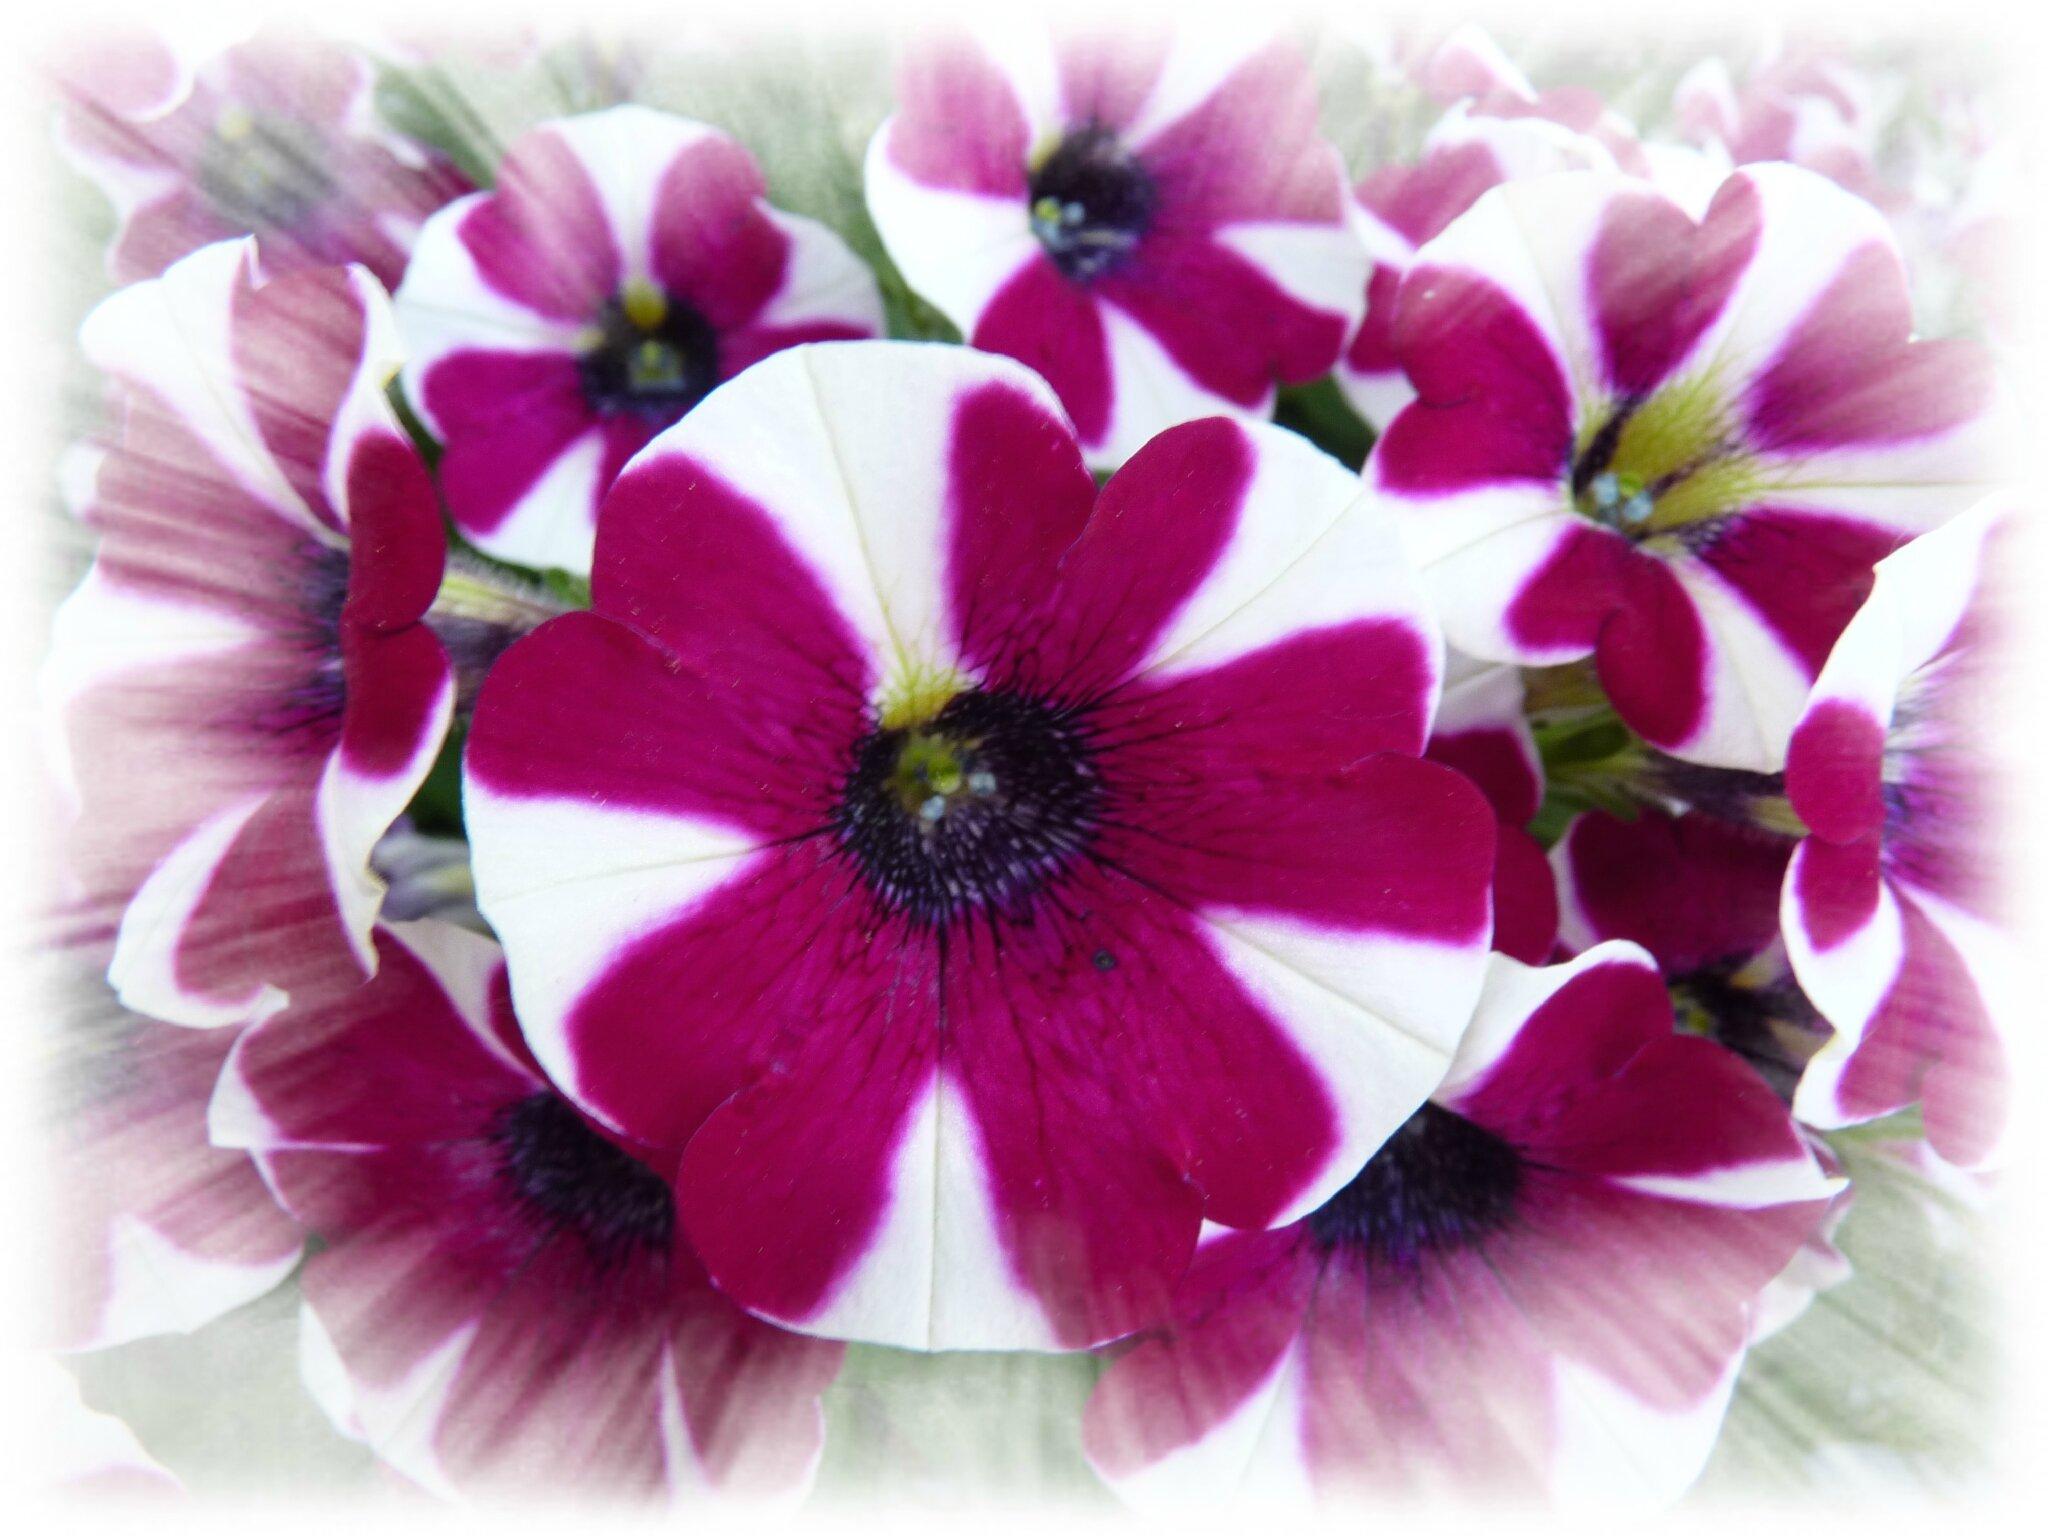 Flowers, flowers :-)